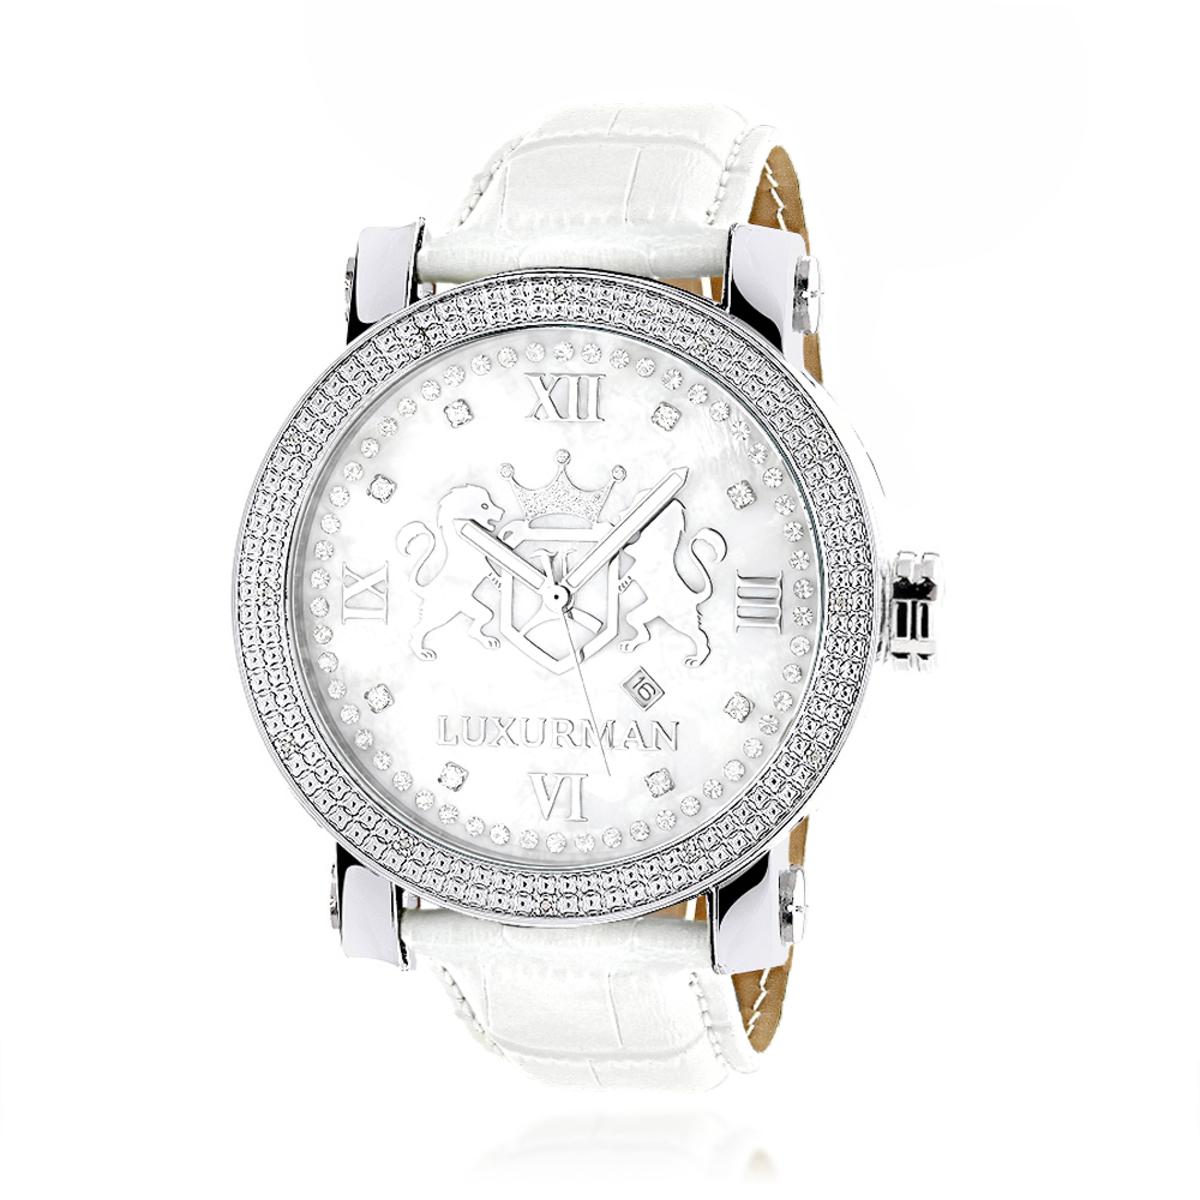 Luxurman Phantom Large Diamond Watch for Men Leather Band White MOP 0.12ct